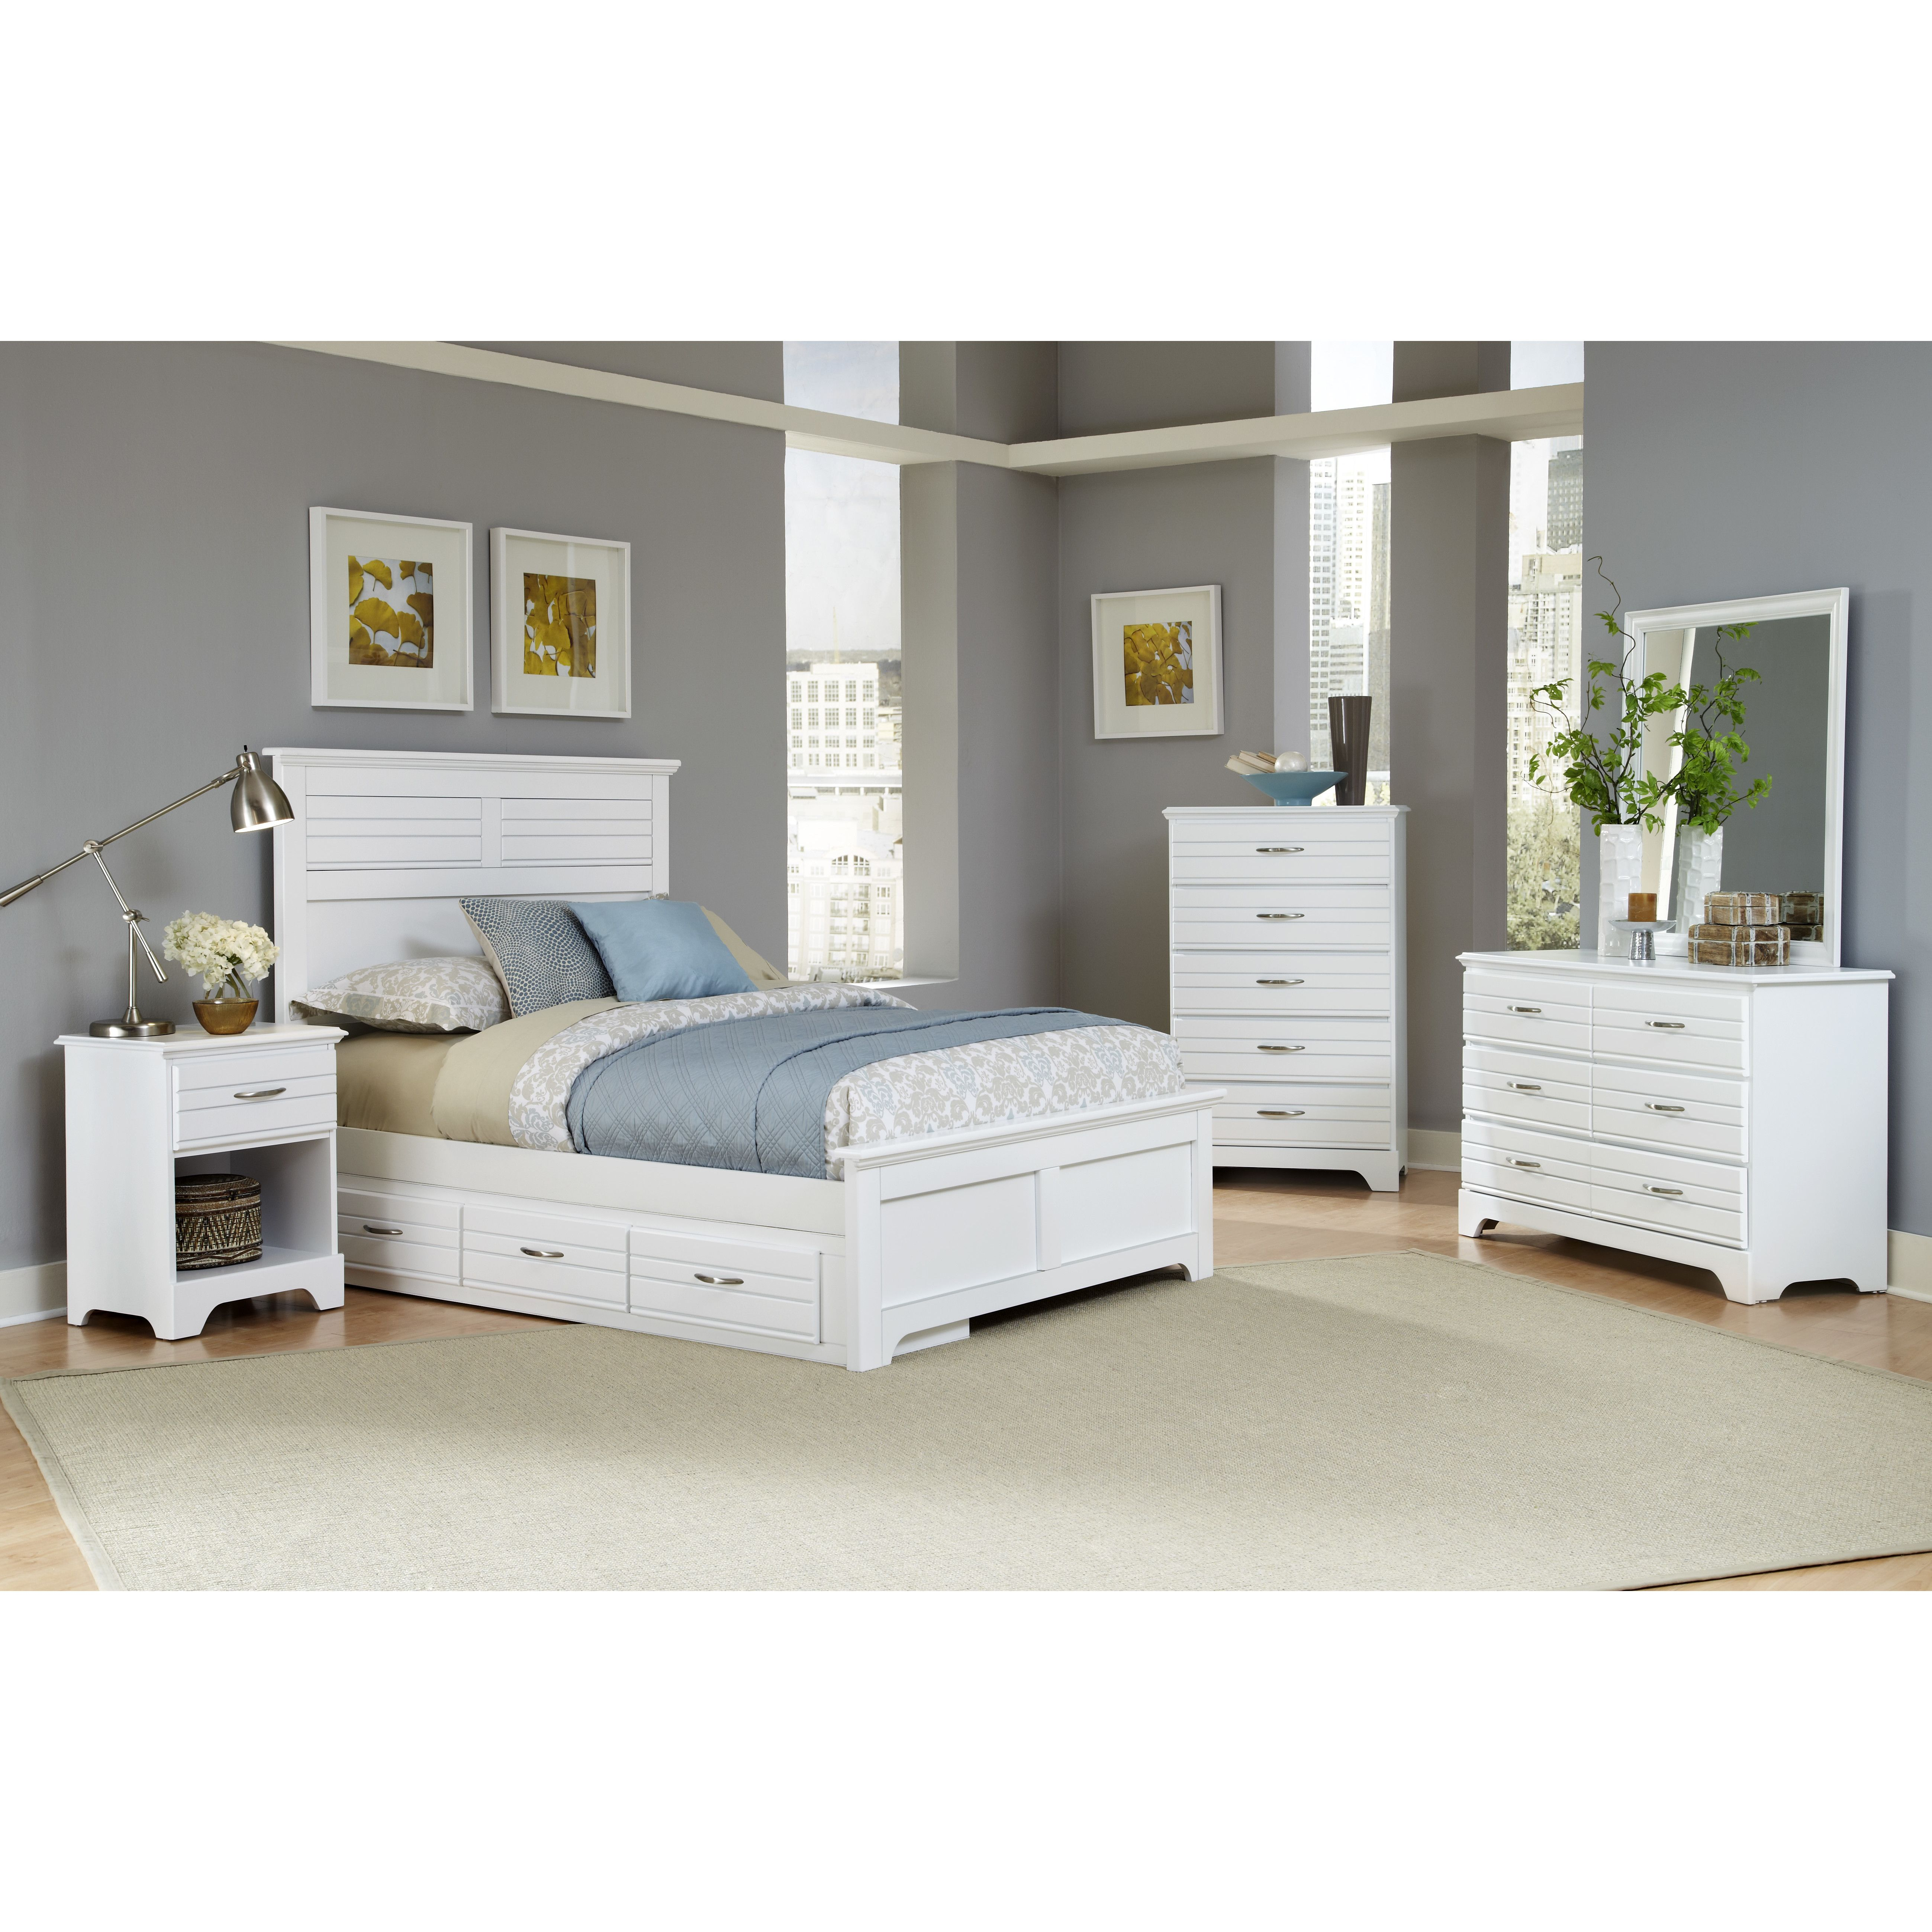 Carolina Furniture Works, Inc. Platinum Wood Headboard